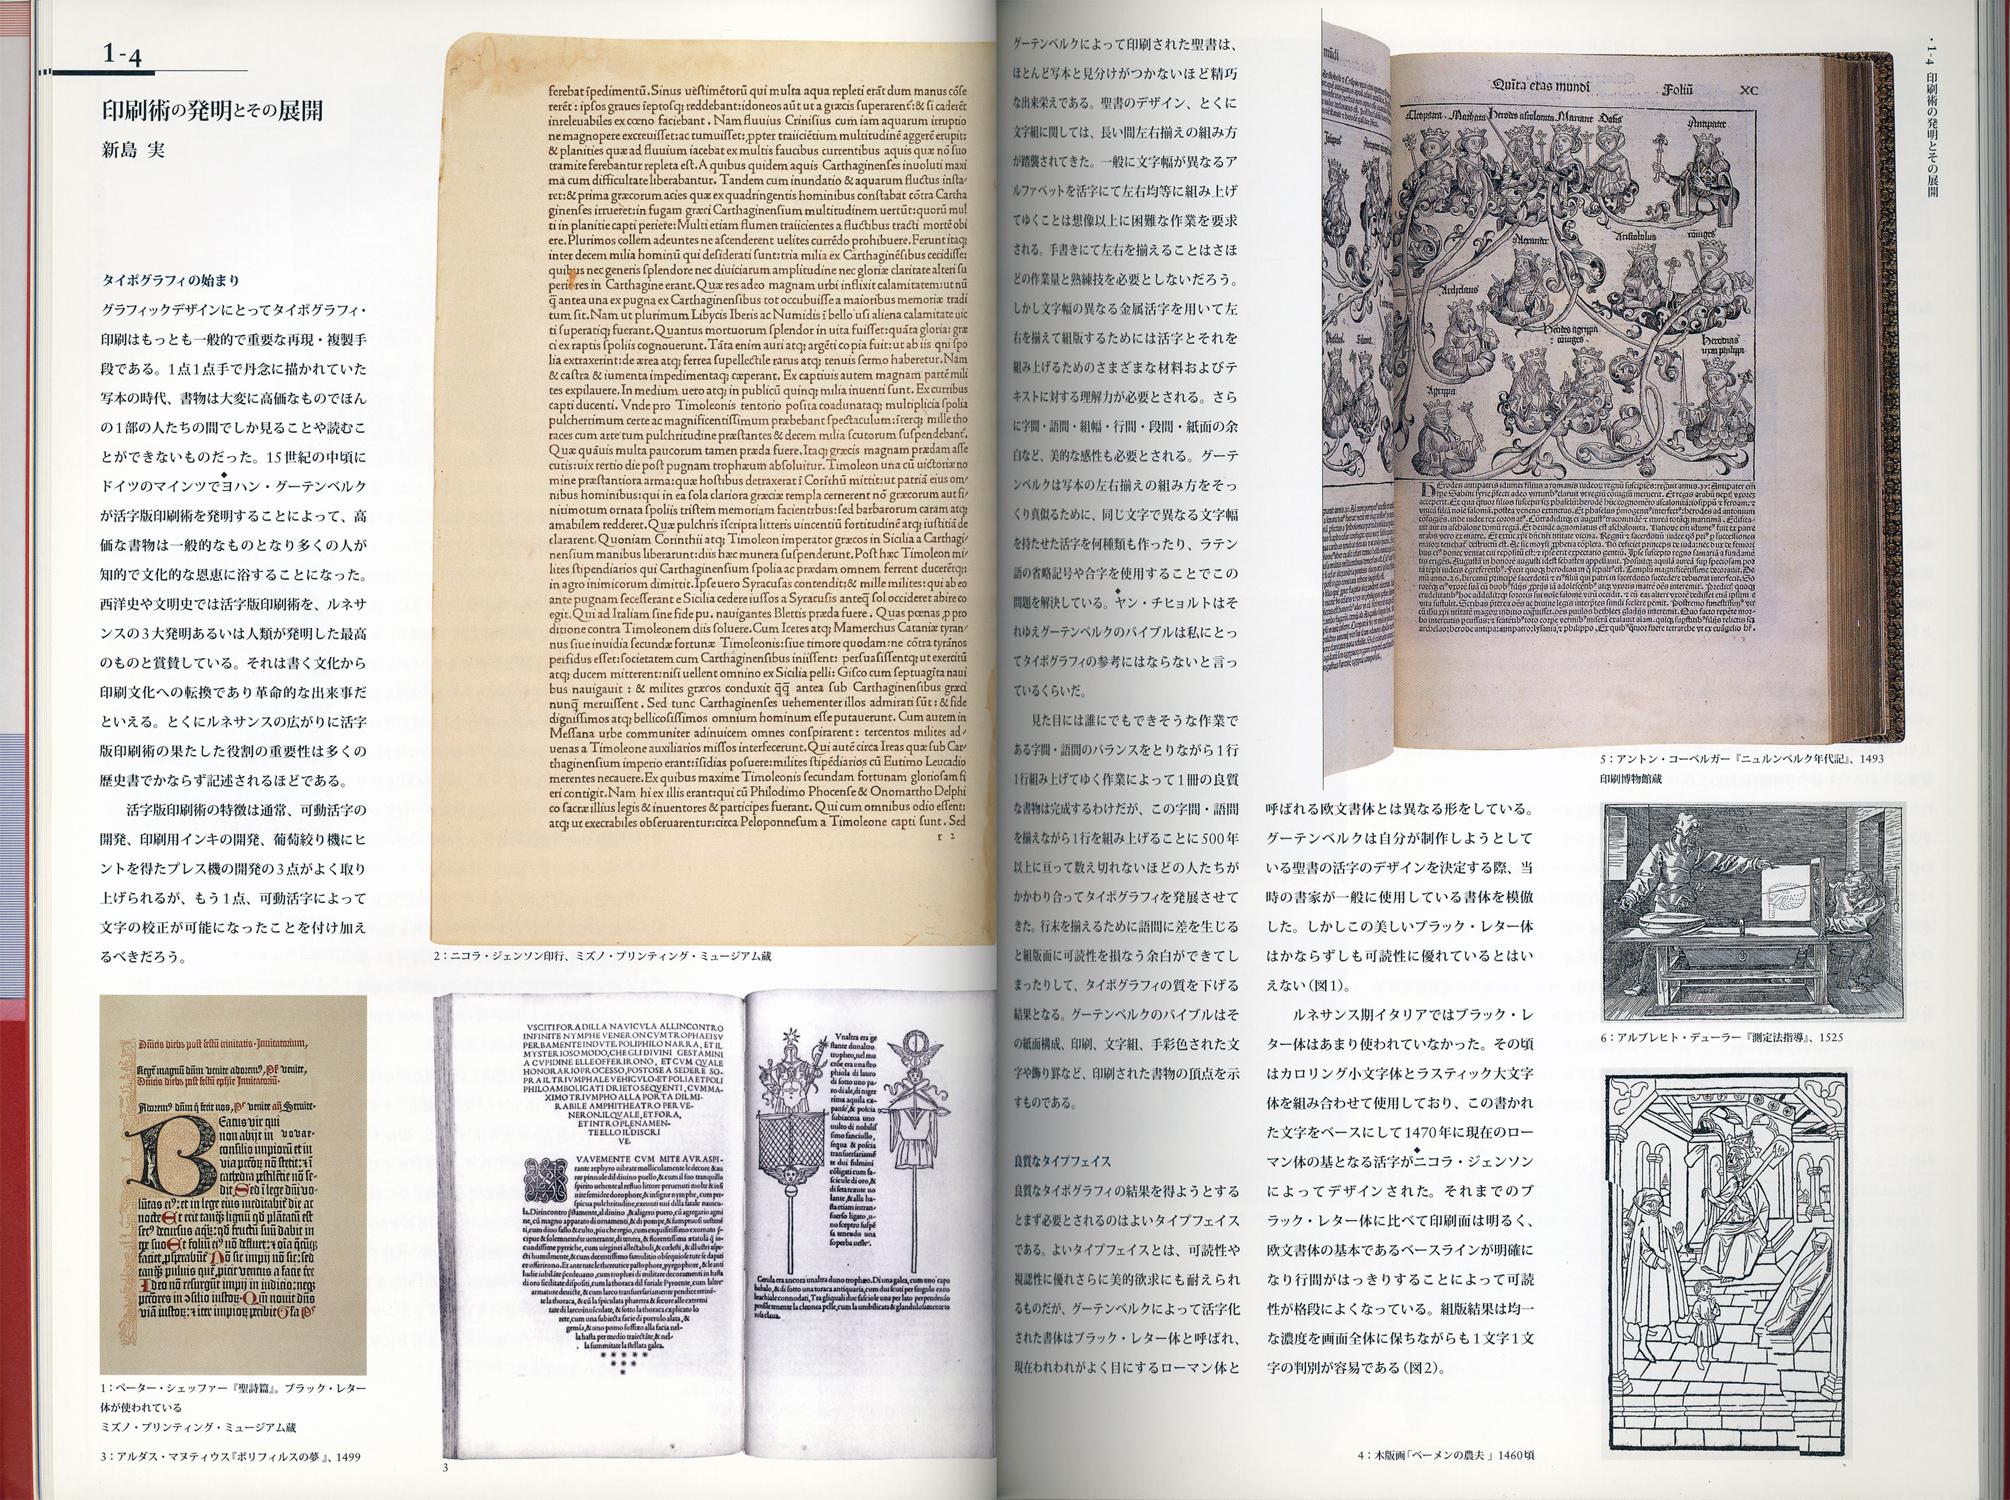 graphic design 視覚伝達デザイン基礎[image3]